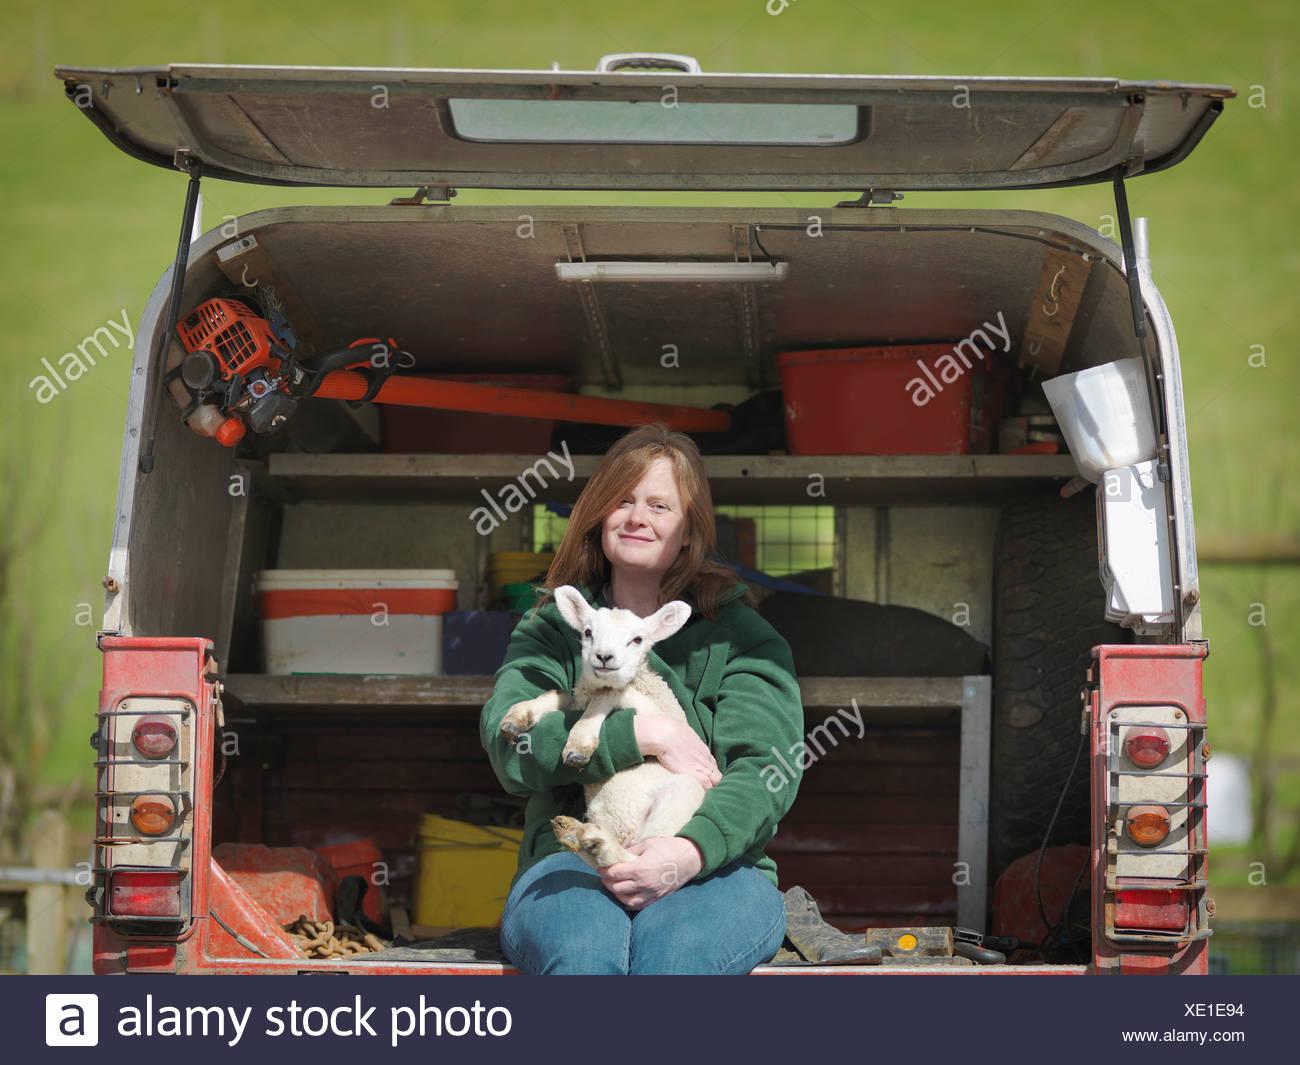 Woman sitting in van boot holding lamb - Stock Image